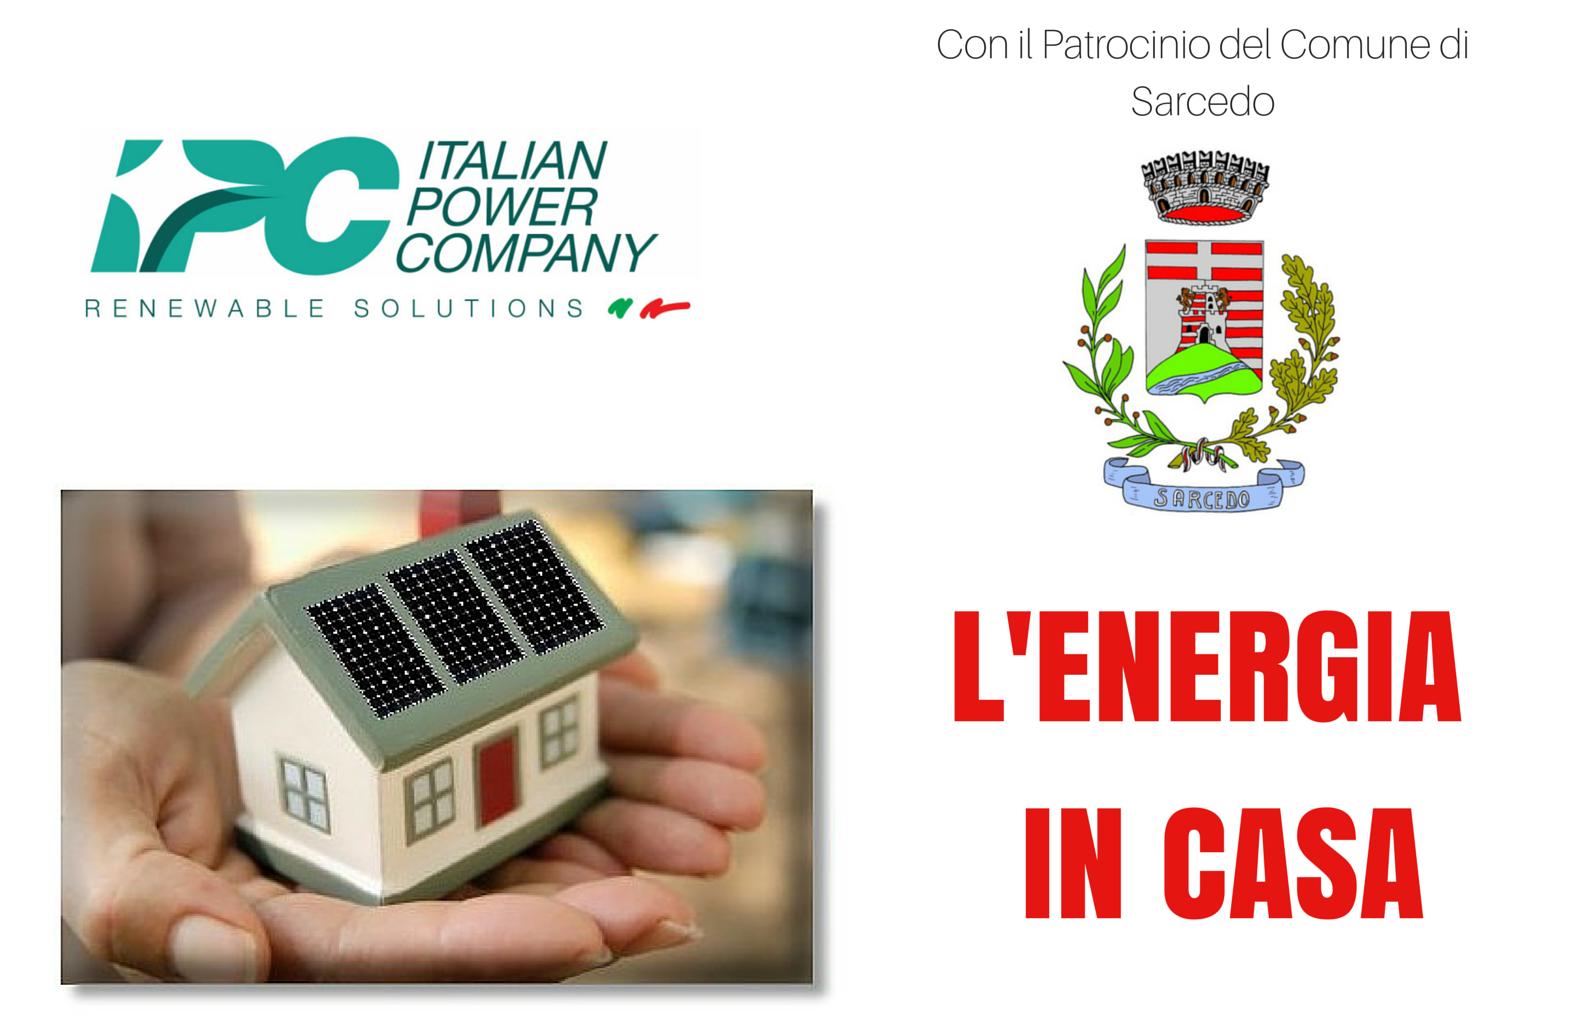 L'Energia in casa - efficienza energetica e risparmio